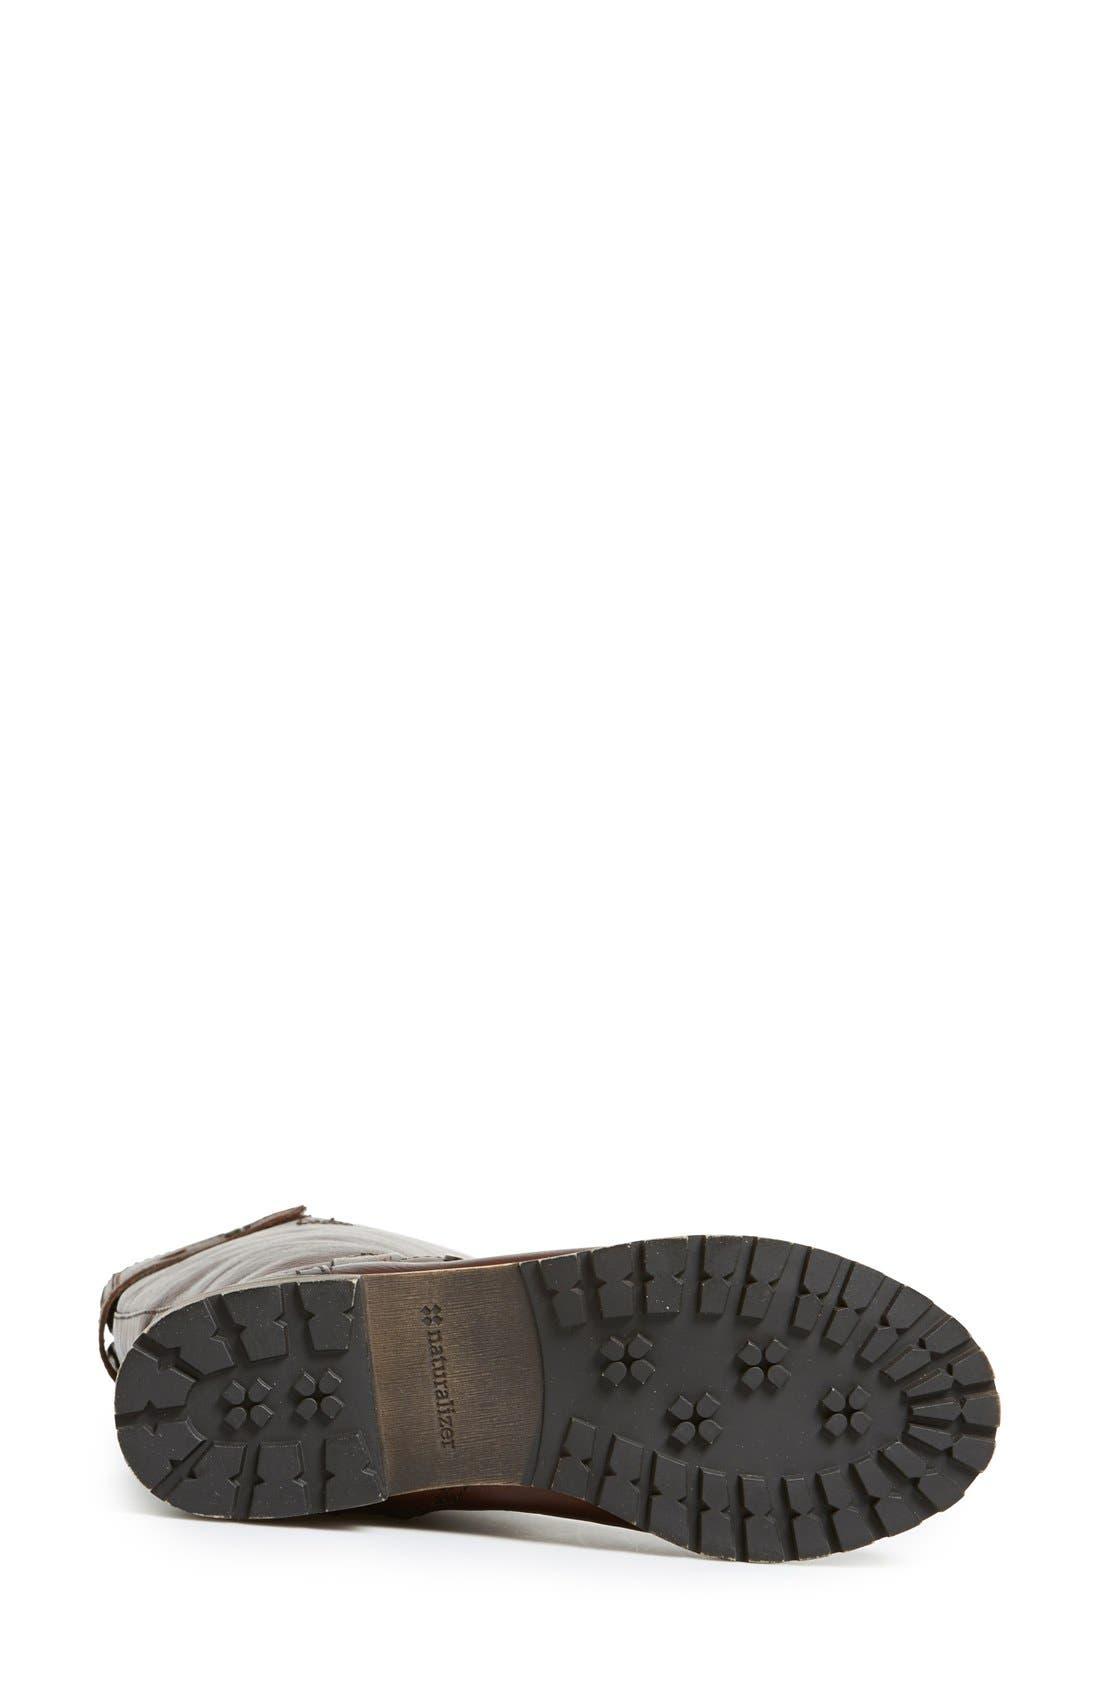 'Tanita' Boot,                             Alternate thumbnail 4, color,                             Tan Leather